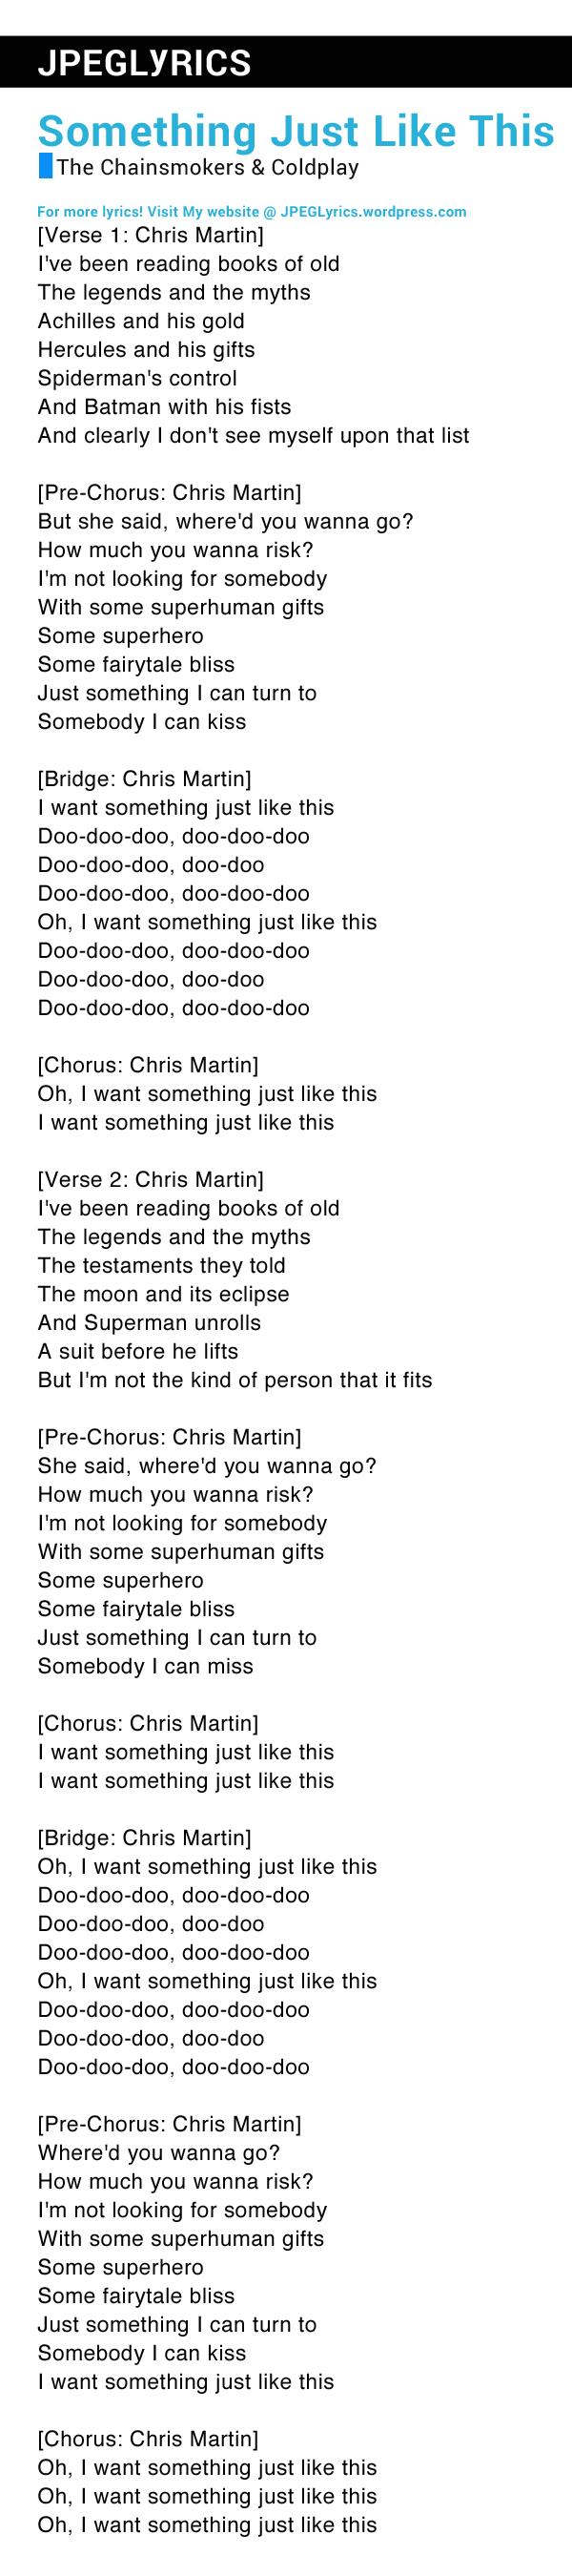 Makna Lagu Something Just Like This : makna, something, Lirik, Something